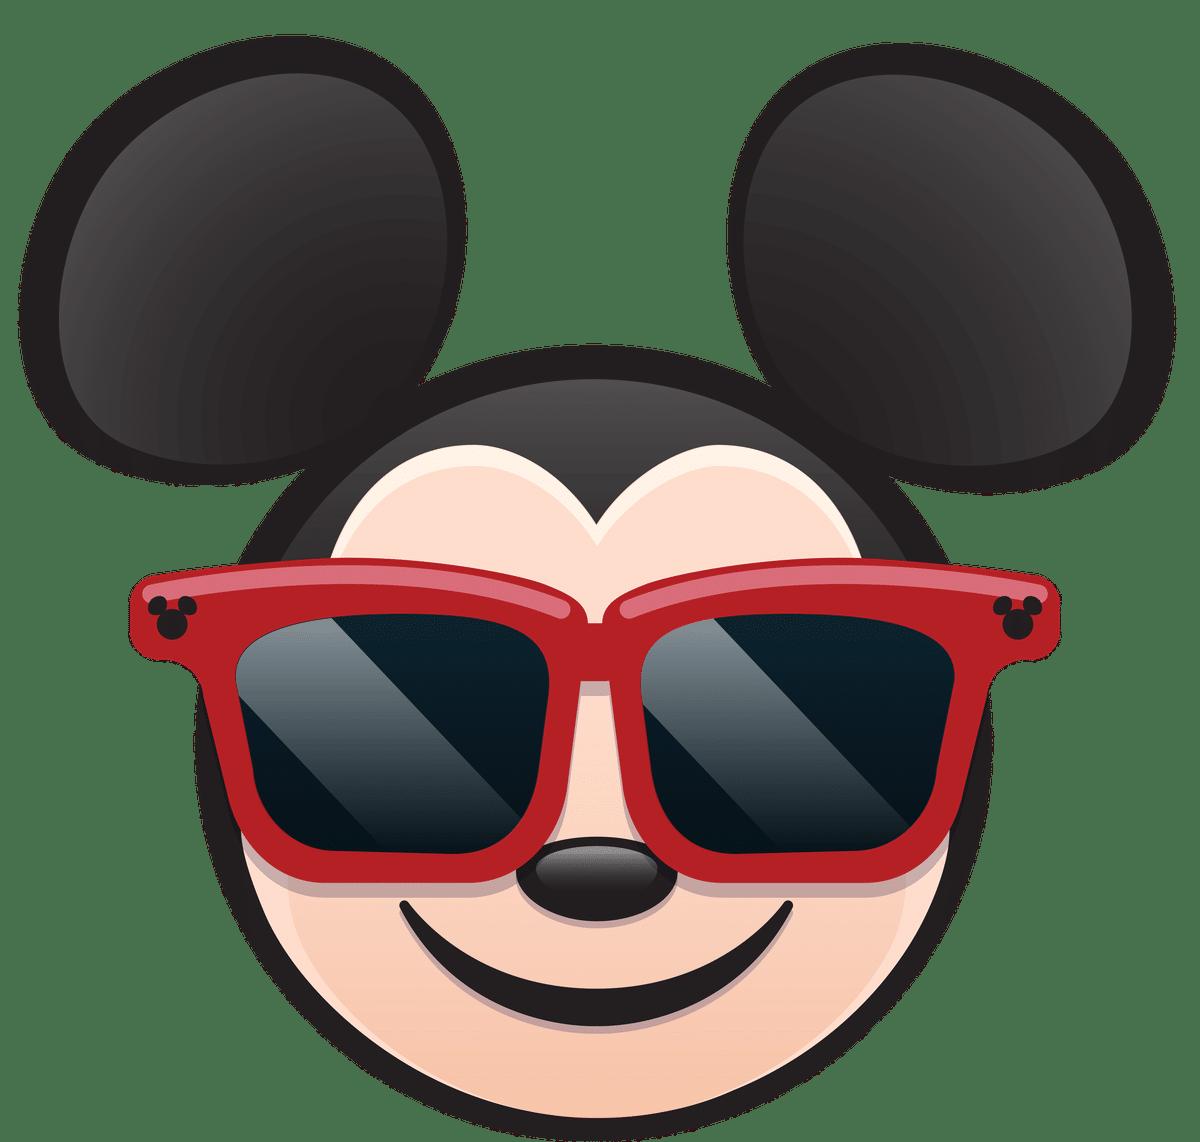 clipart sunglasses mickey